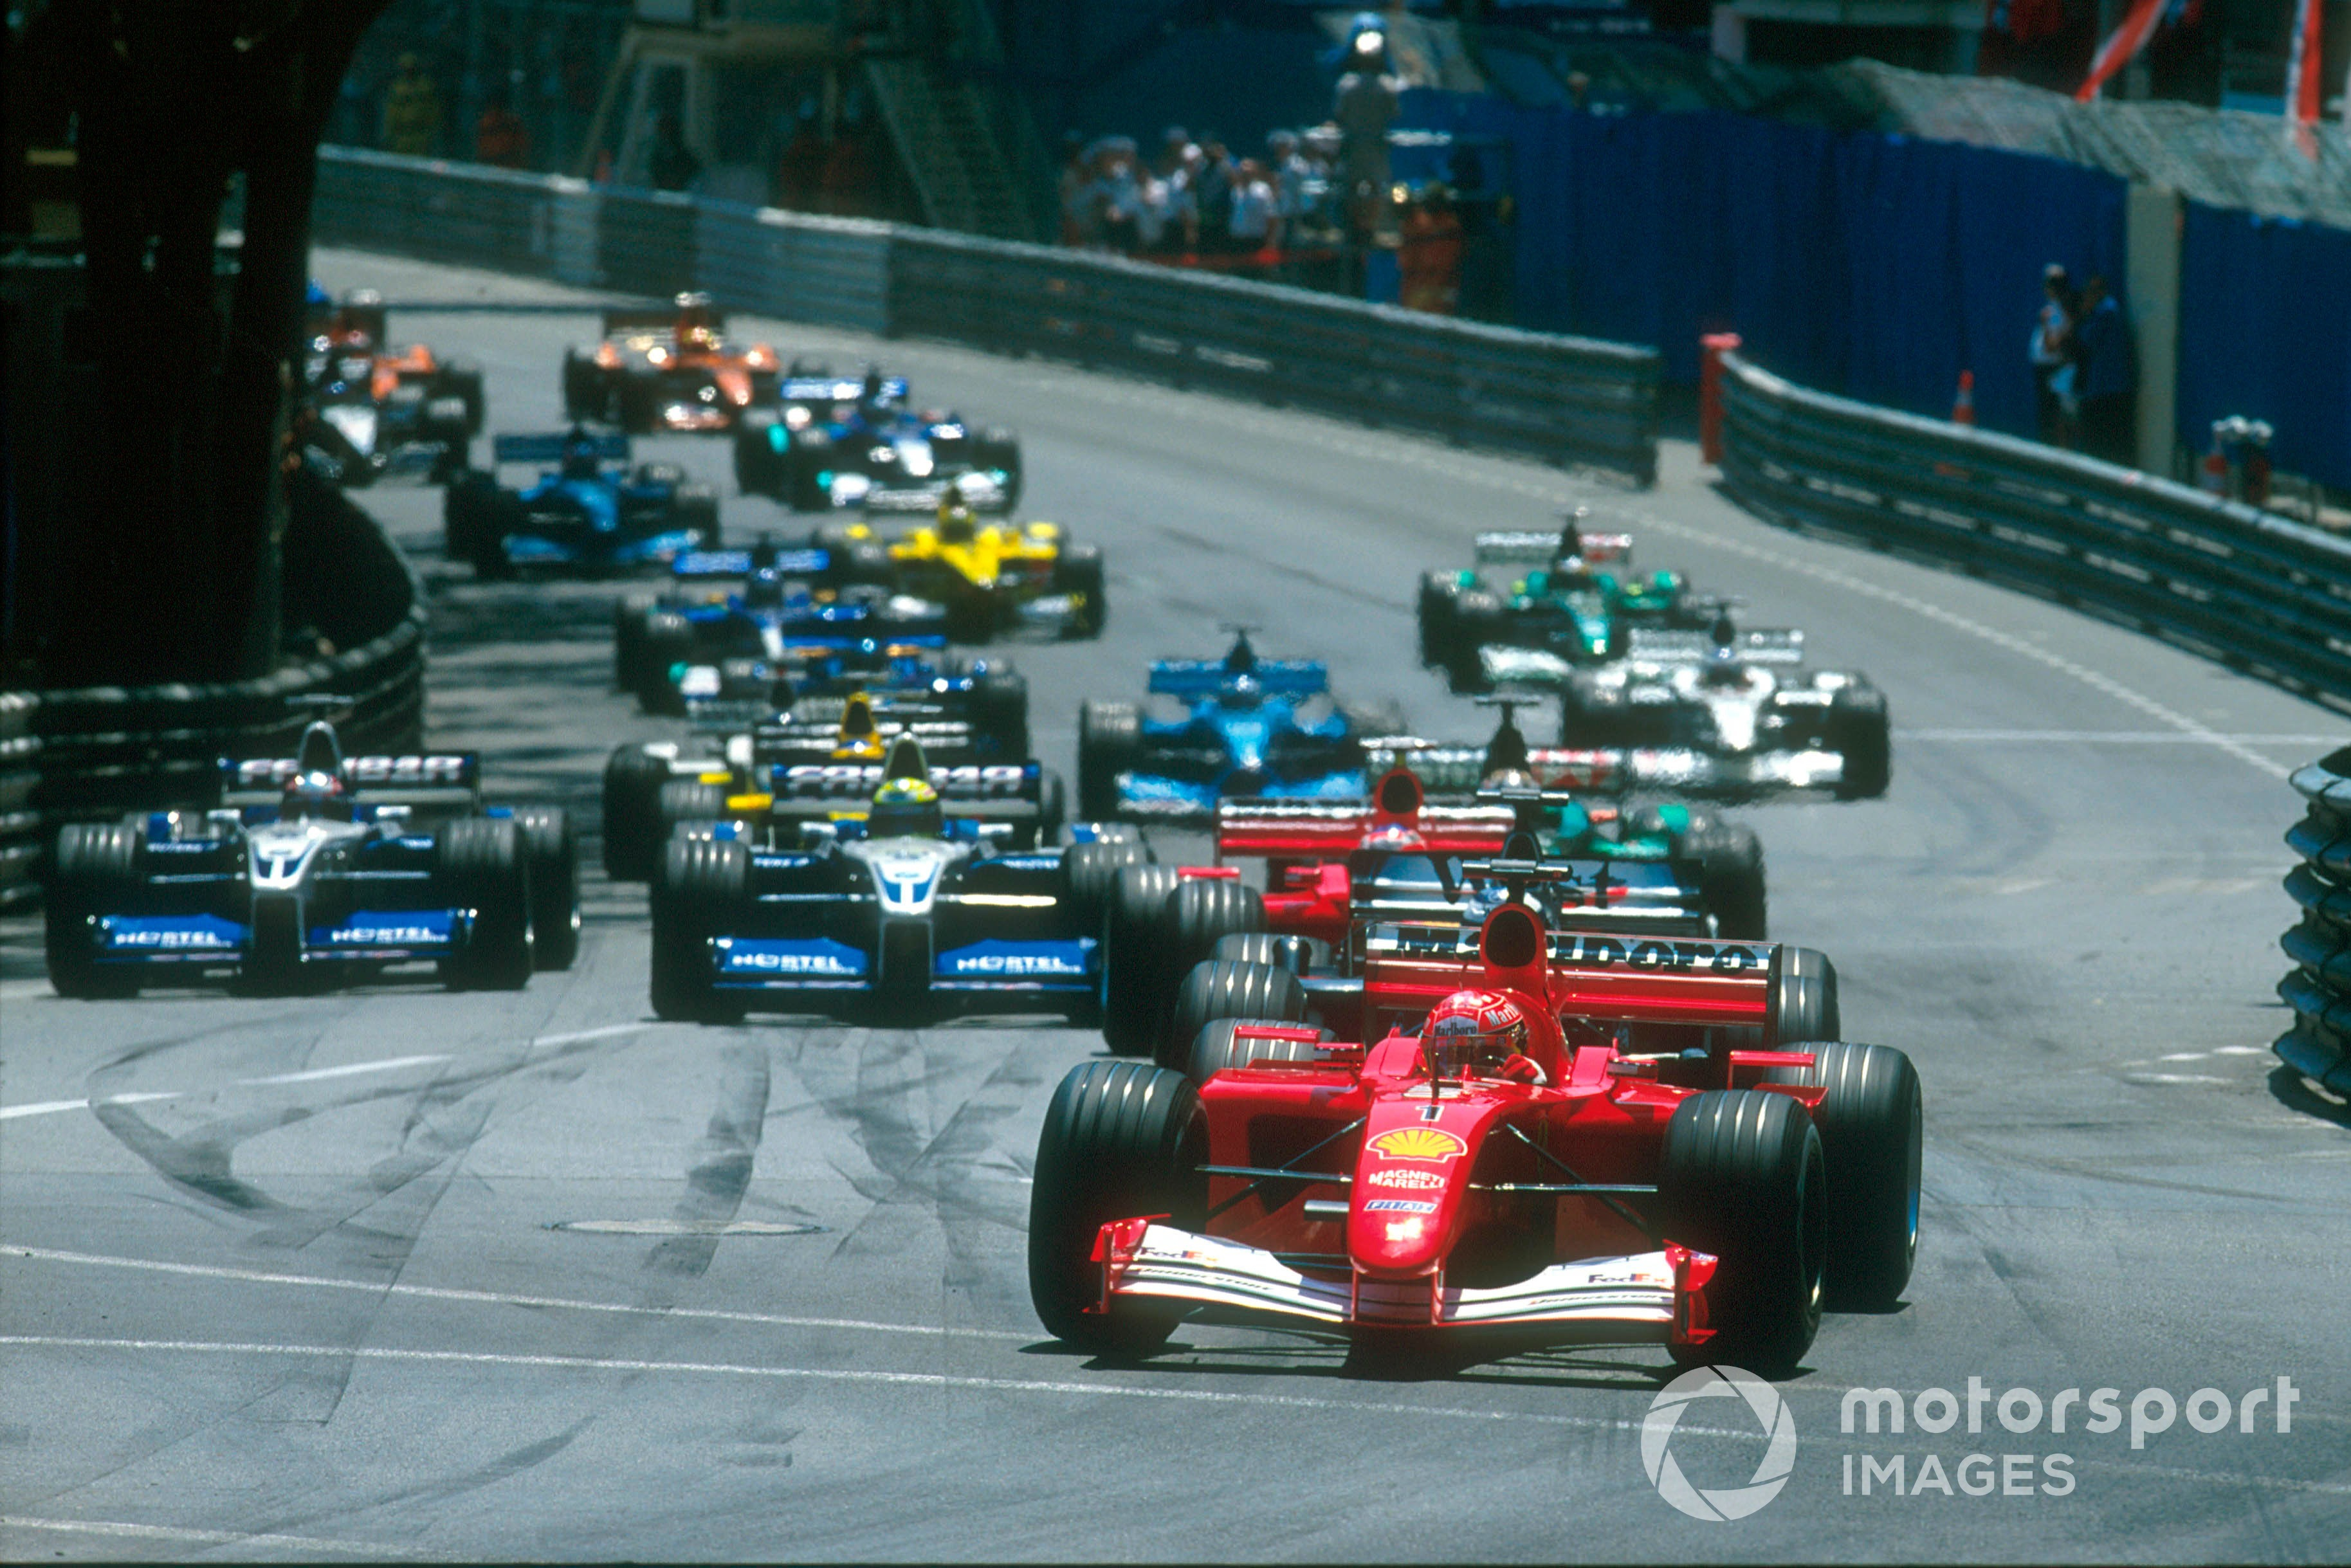 Michael Schumacher, Ferrari F2001, 2001 Monaco GP